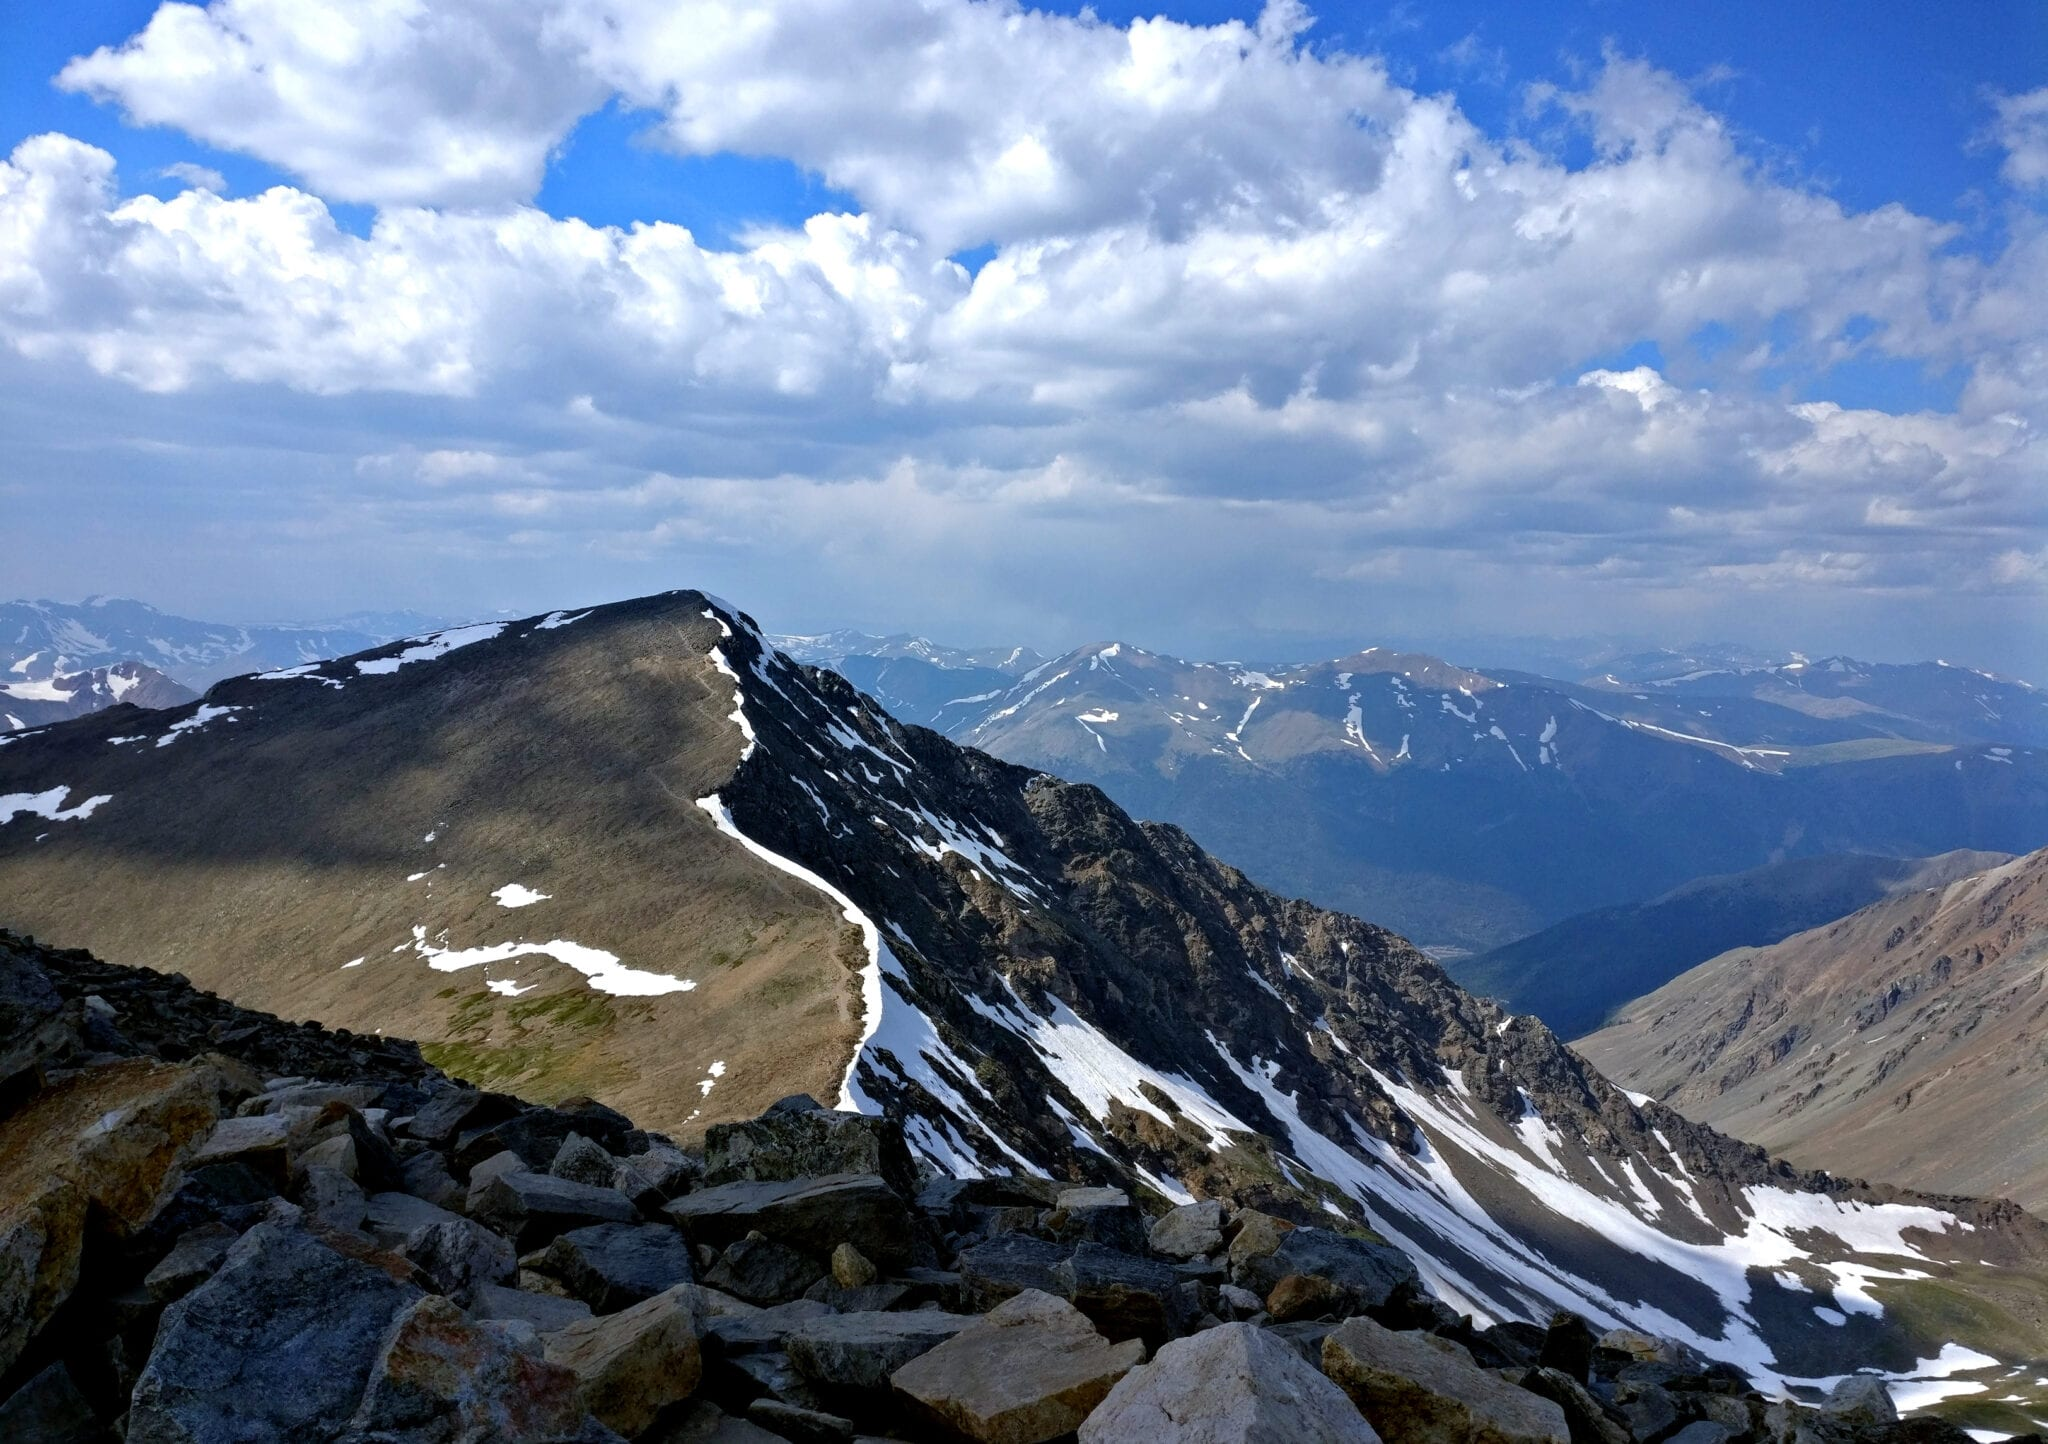 Grays Peak, Colorado